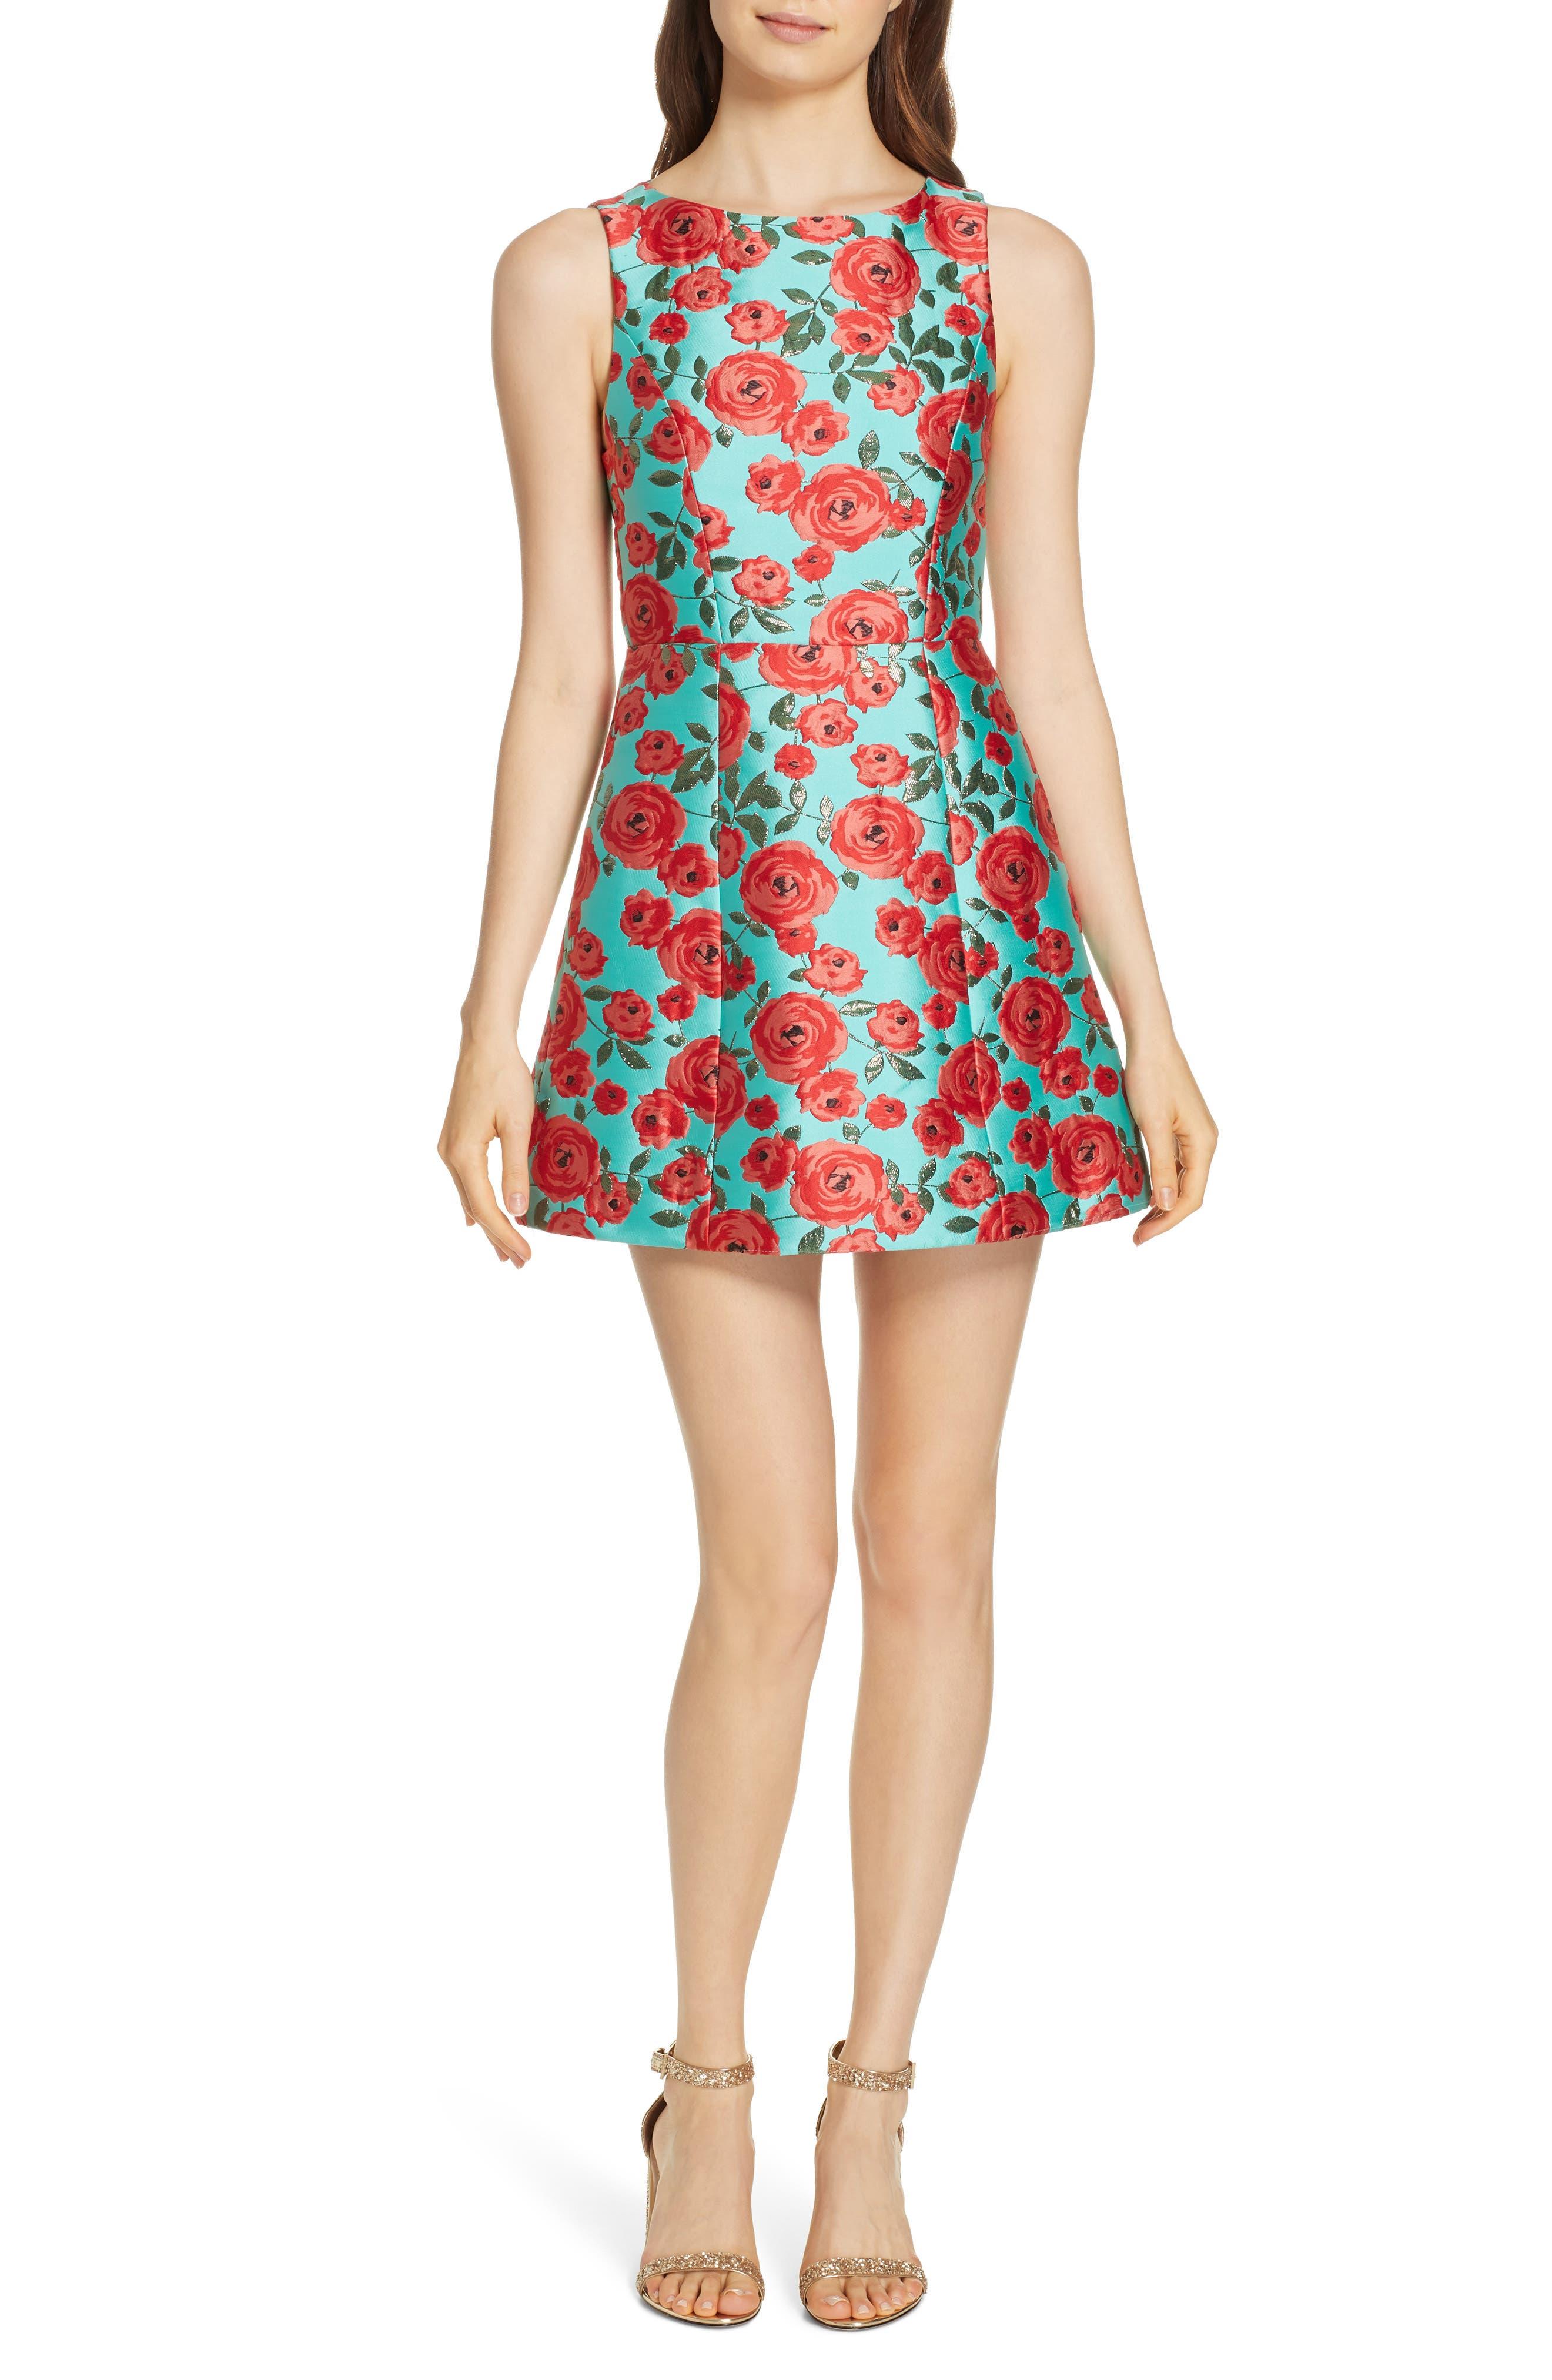 Lindsey Structured Fit & Flare Dress in Light Aqua Multi